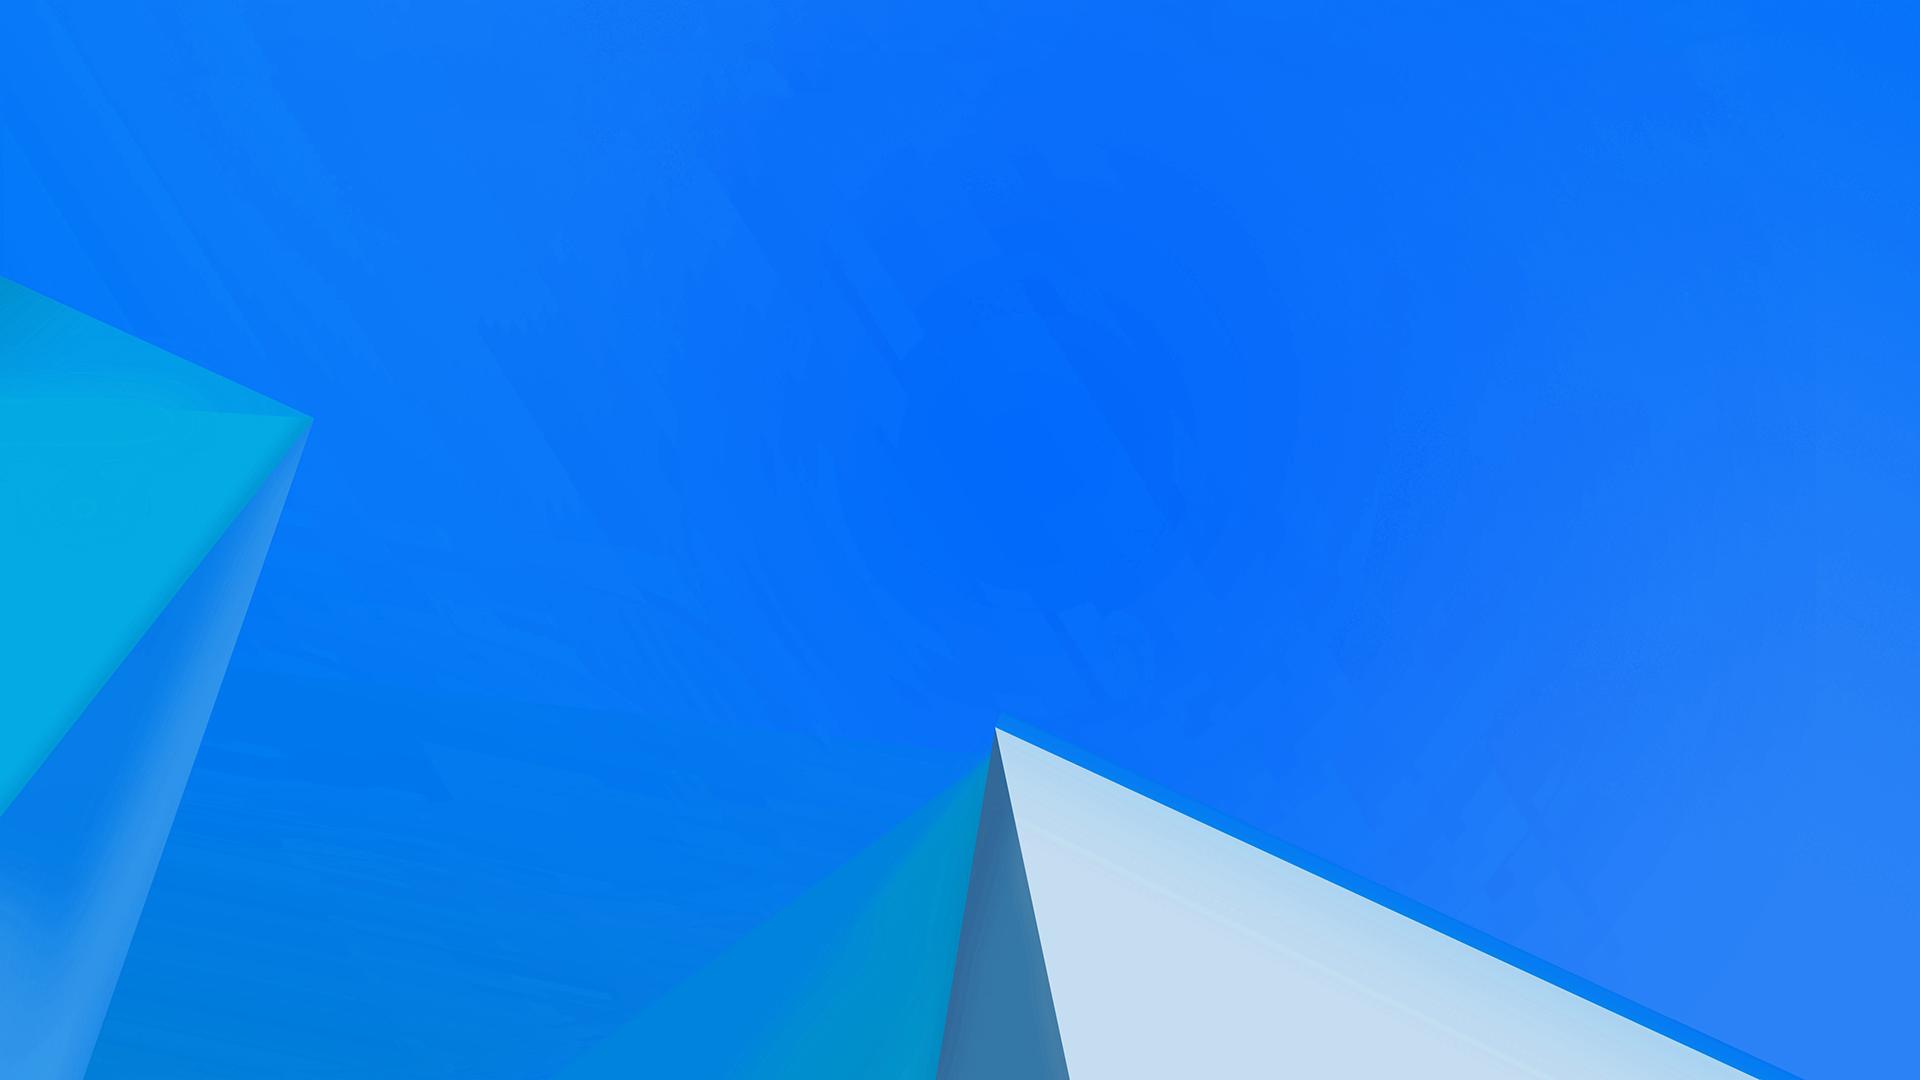 windows 8 1 wallpaper blue by studio384 watch customization wallpaper 1920x1080